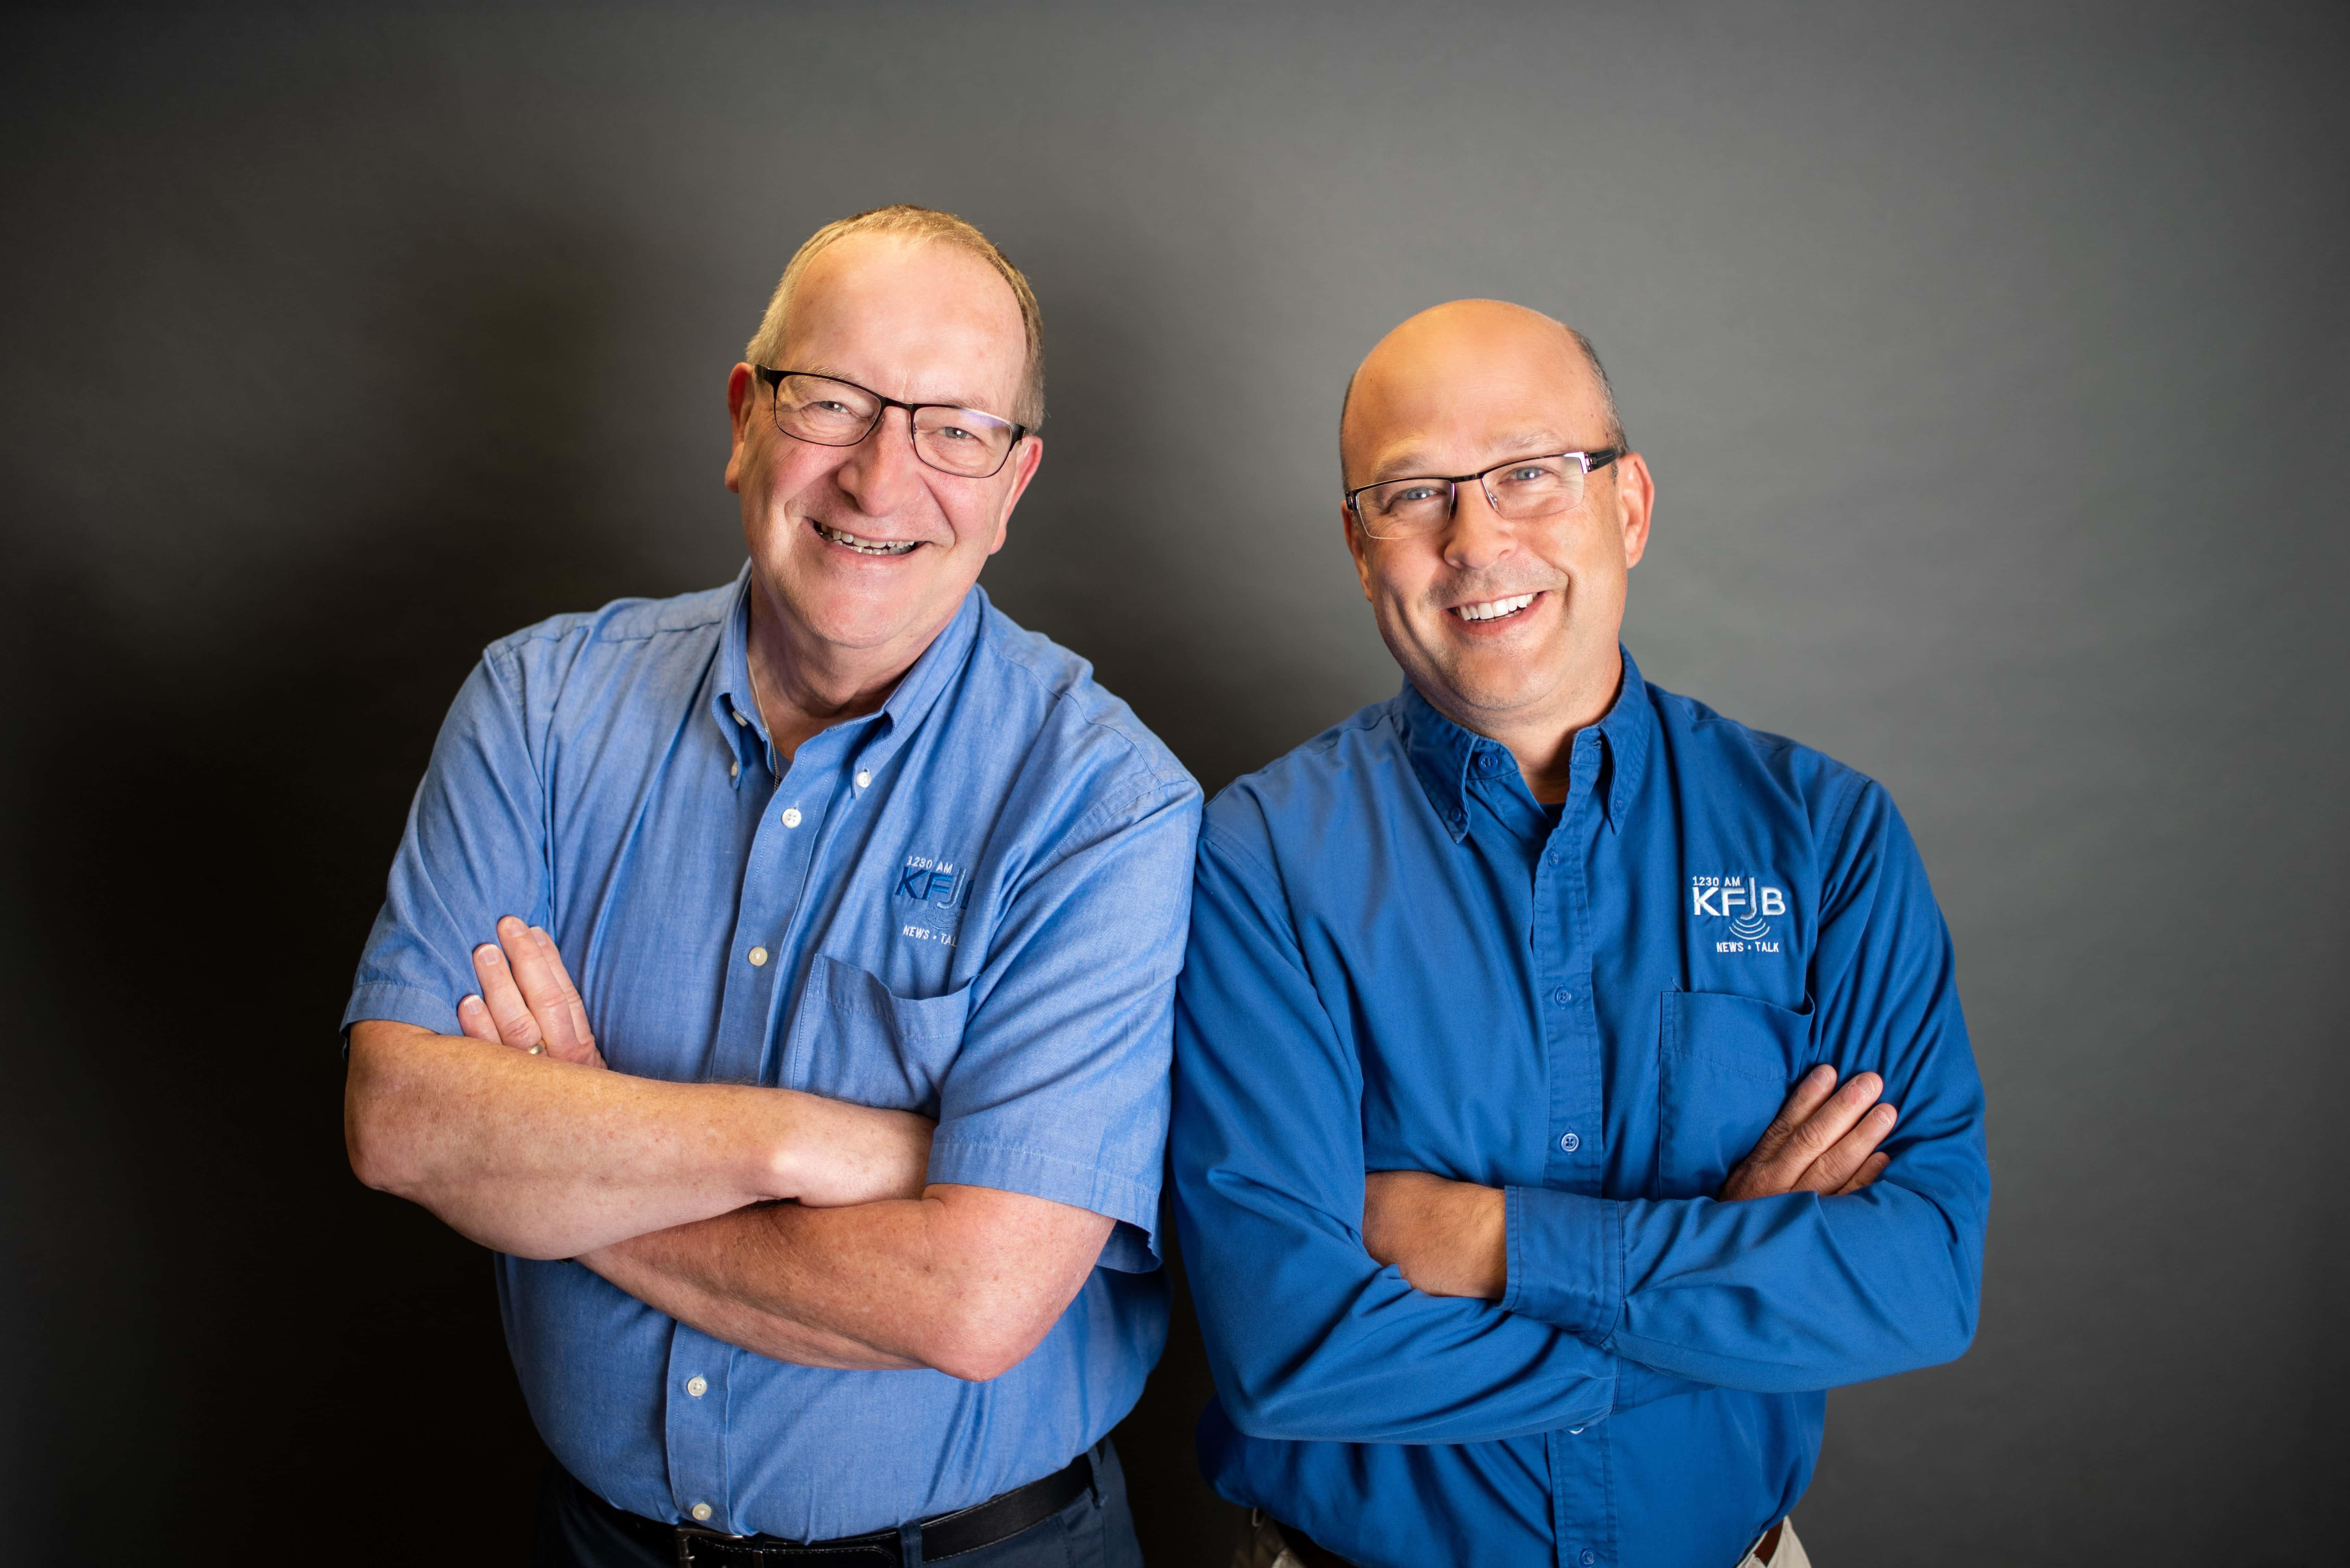 Kyle & Ken's Podcast